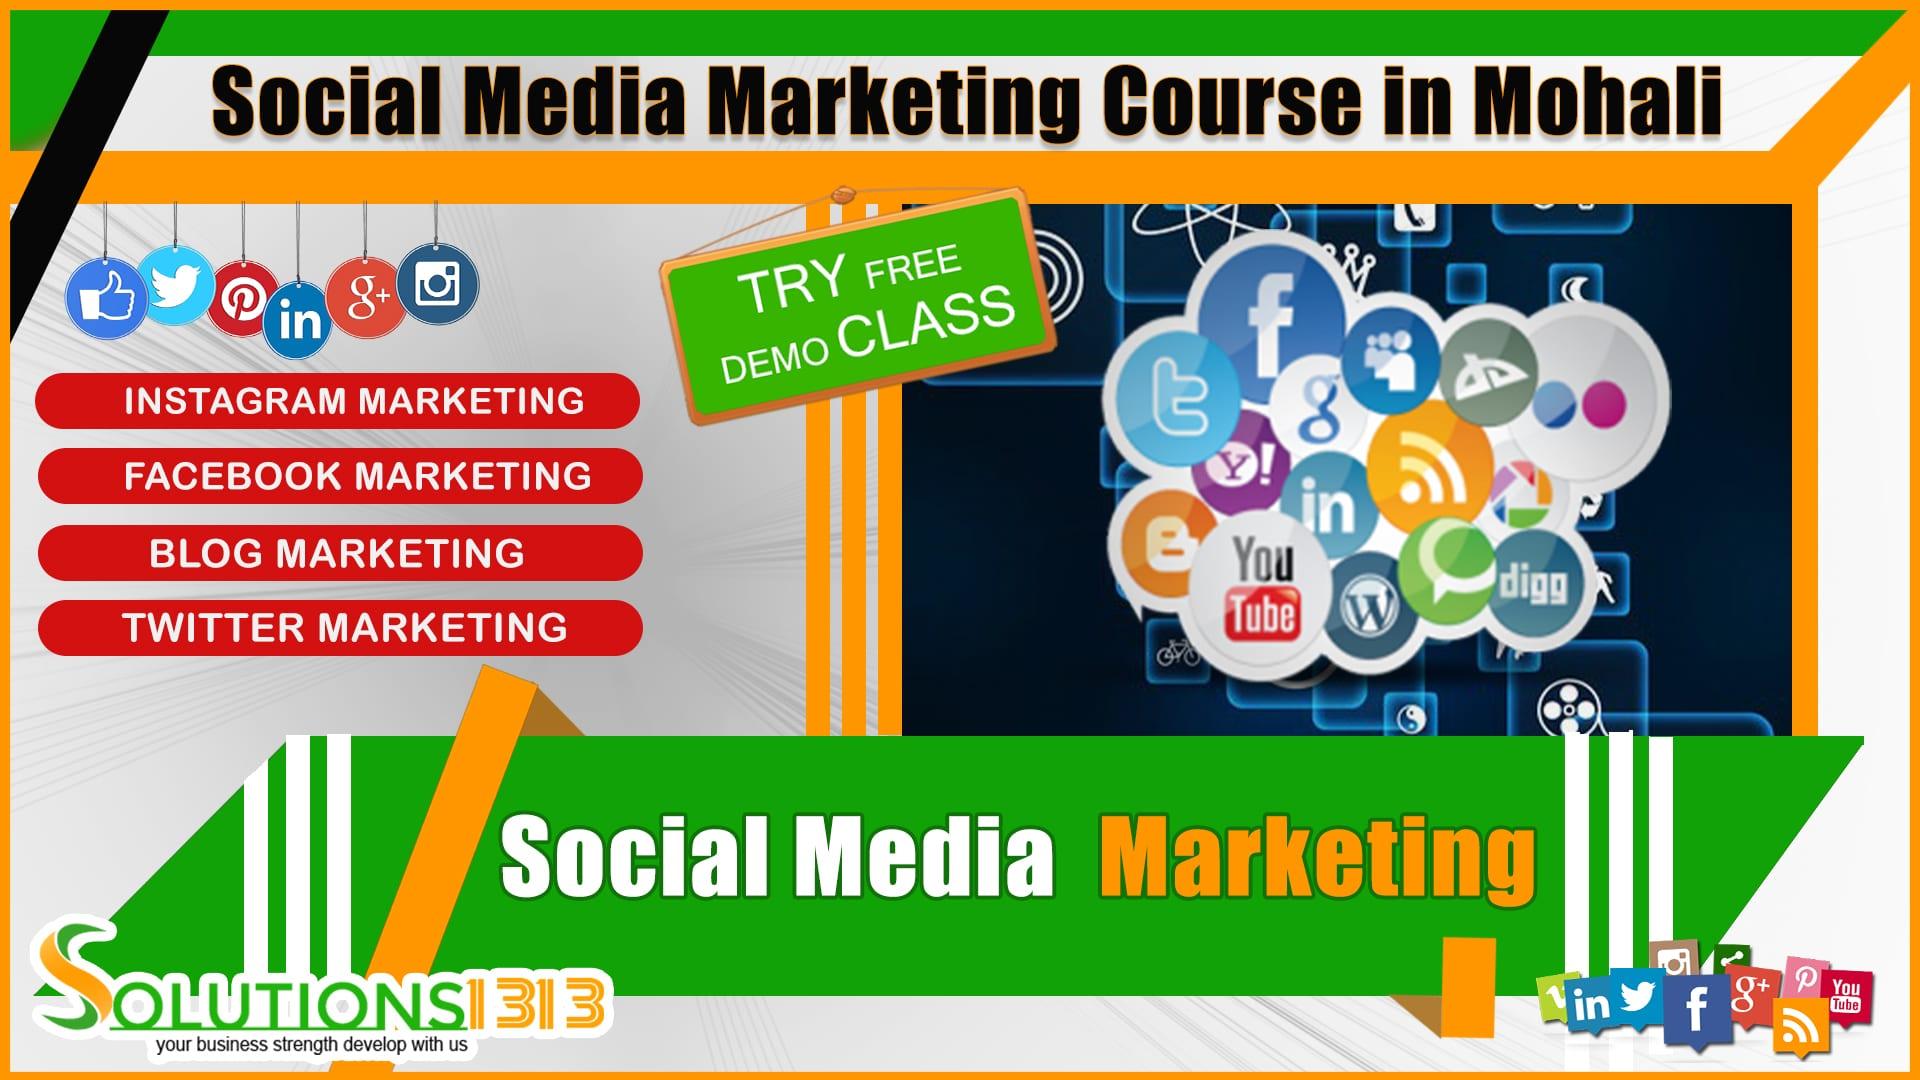 Social Media Marketing Course in Mohali